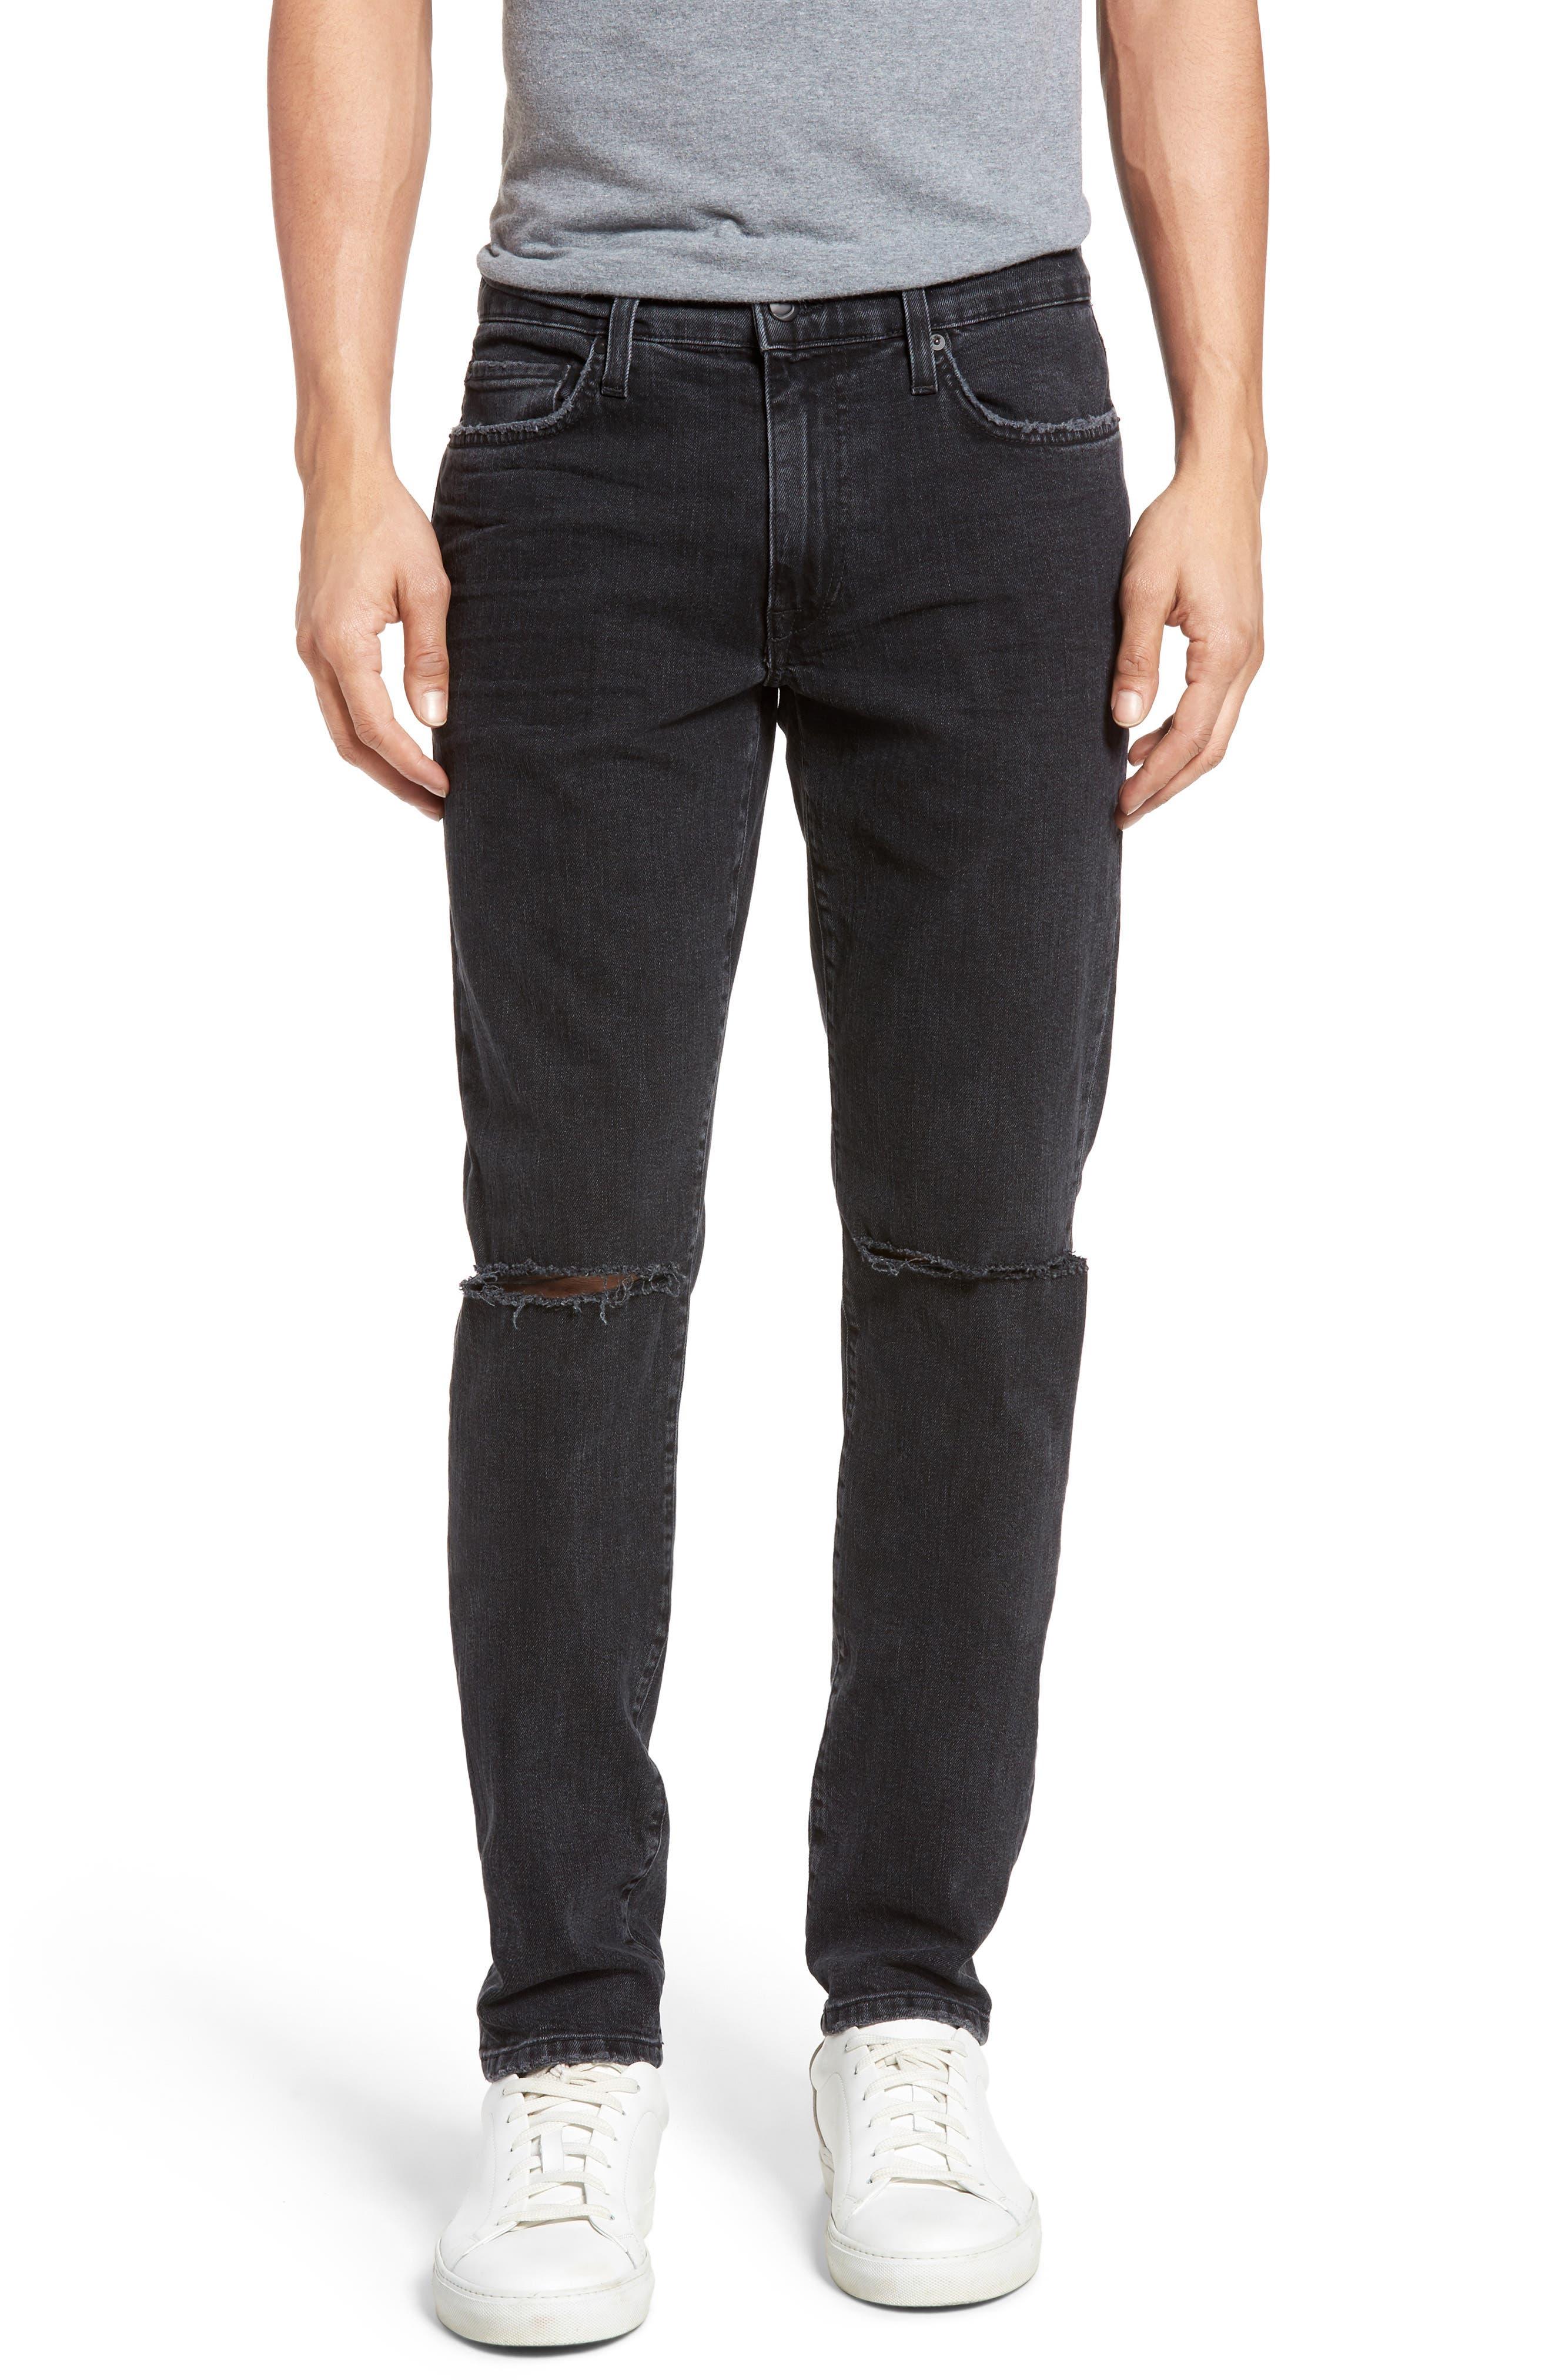 Brixton Slim Straight Fit Jeans,                         Main,                         color, 438